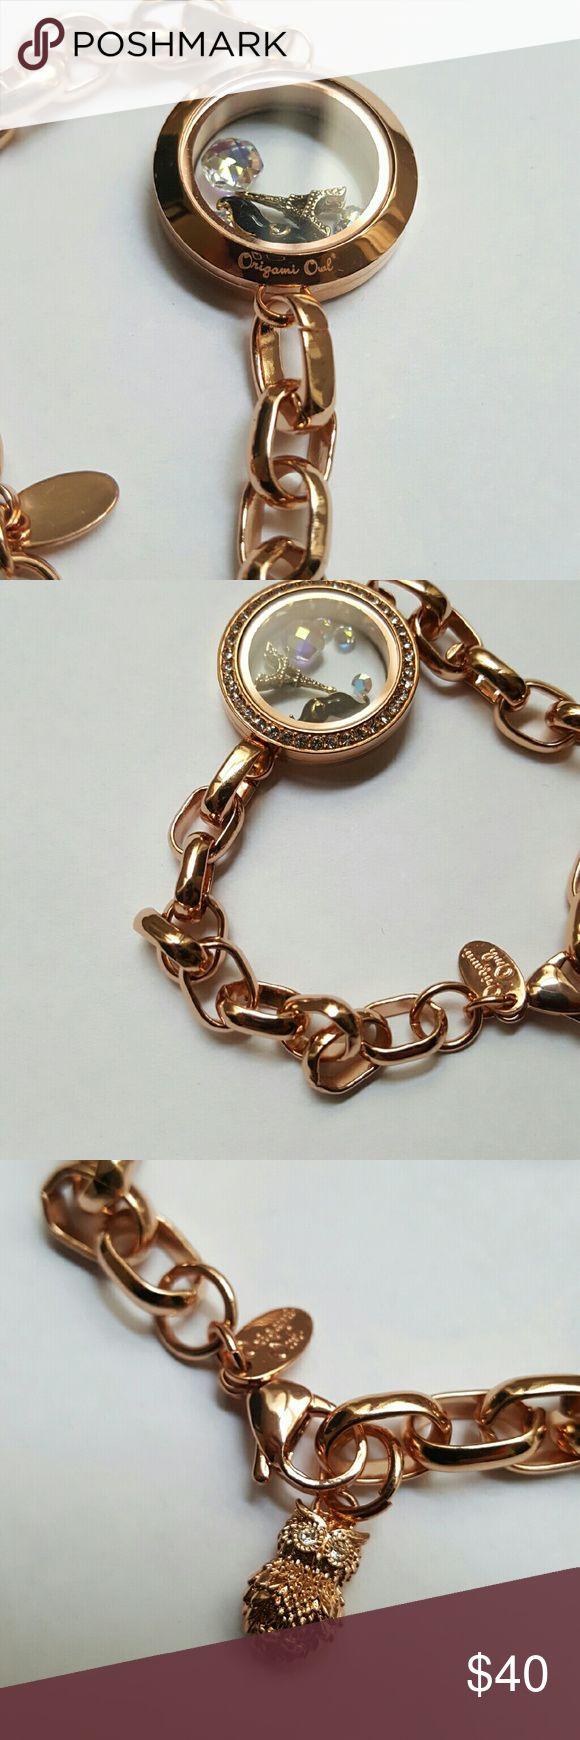 Authentic Origami Owl living locket bracelet .. Jewelry Bracelets